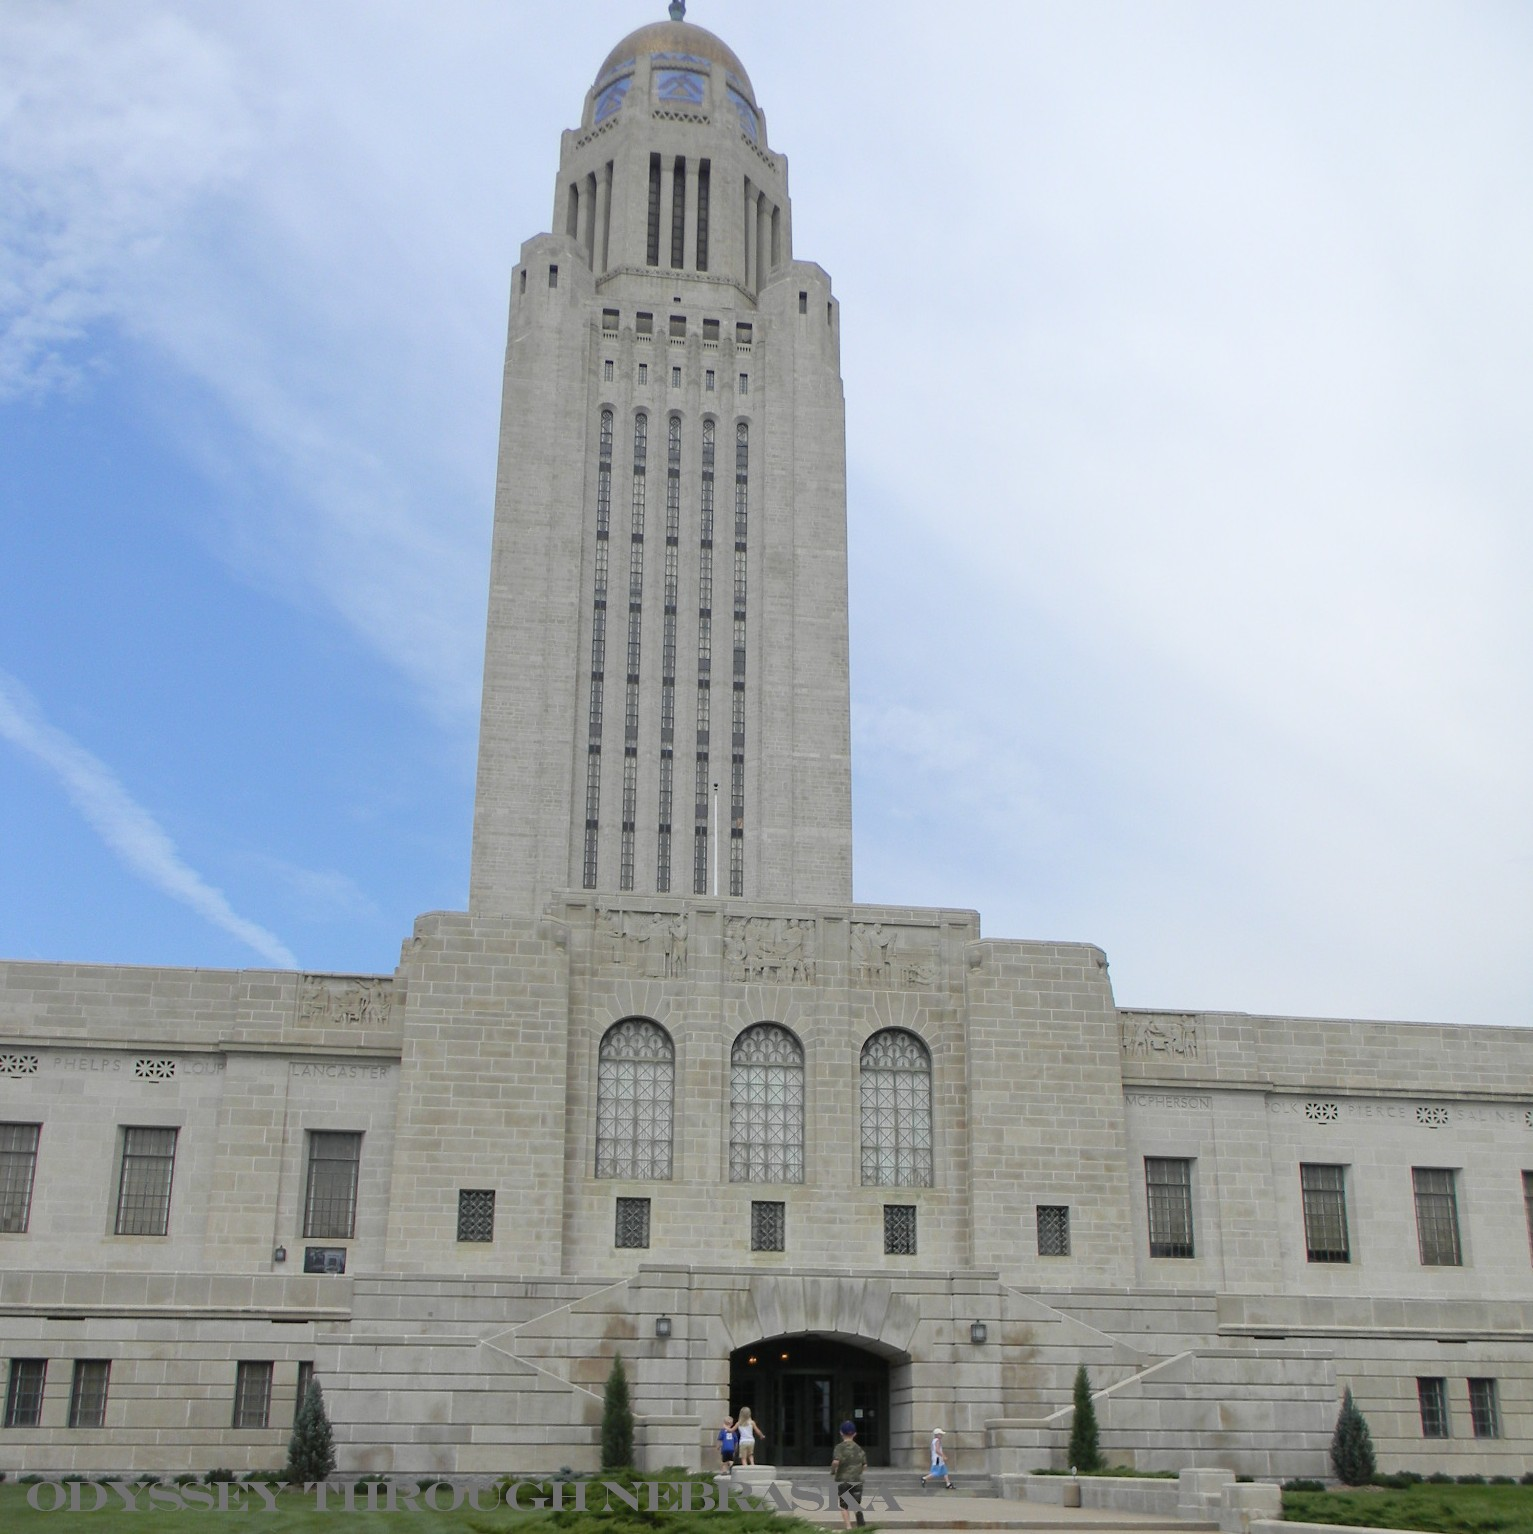 The Nebraska Capitol is a masterpiece